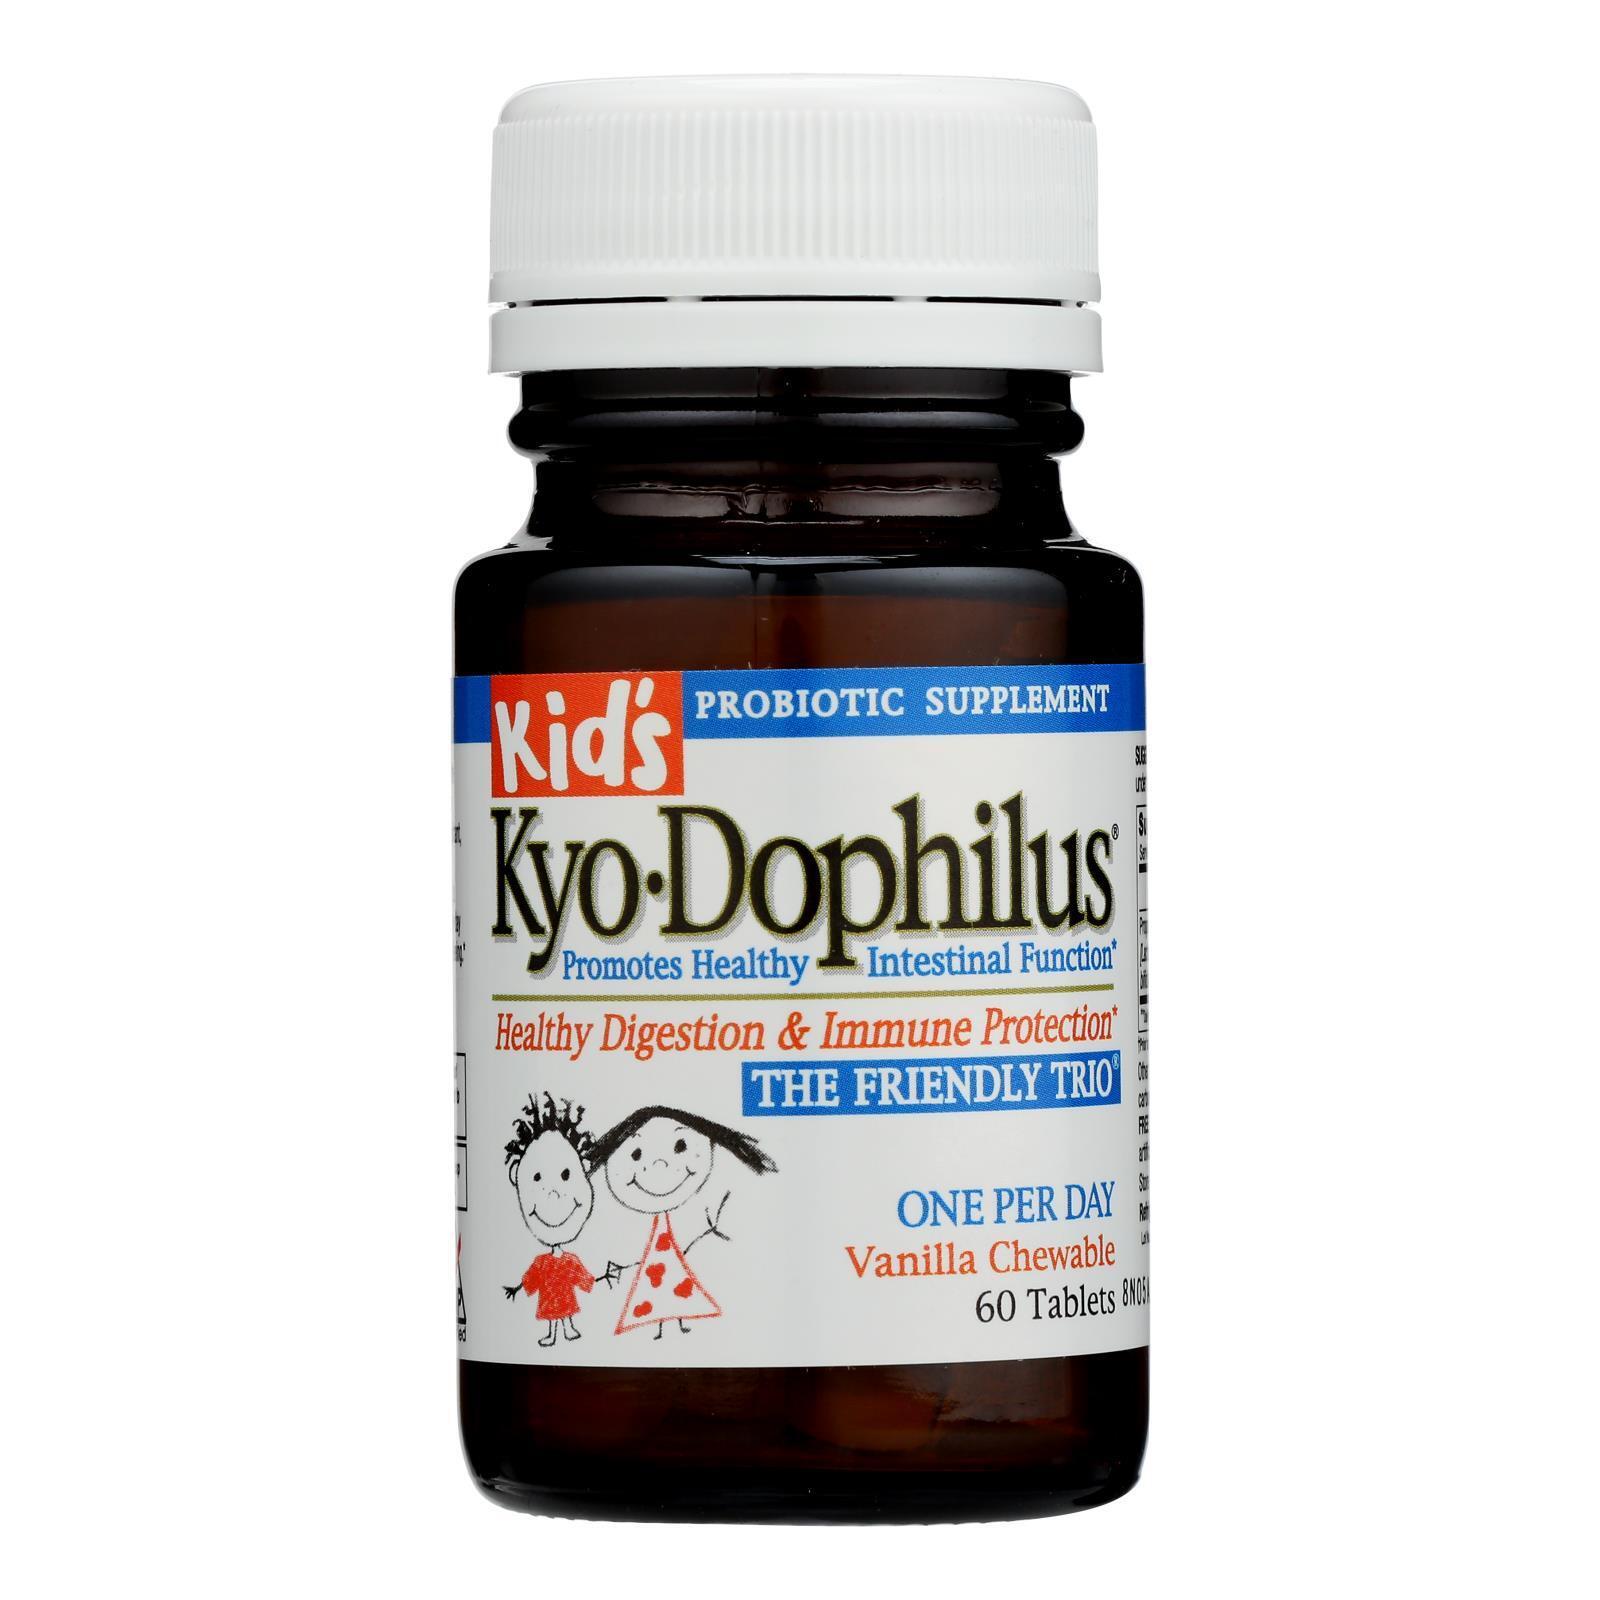 Kyolic Kid's Kyo-Dophilus - 60 Tablets